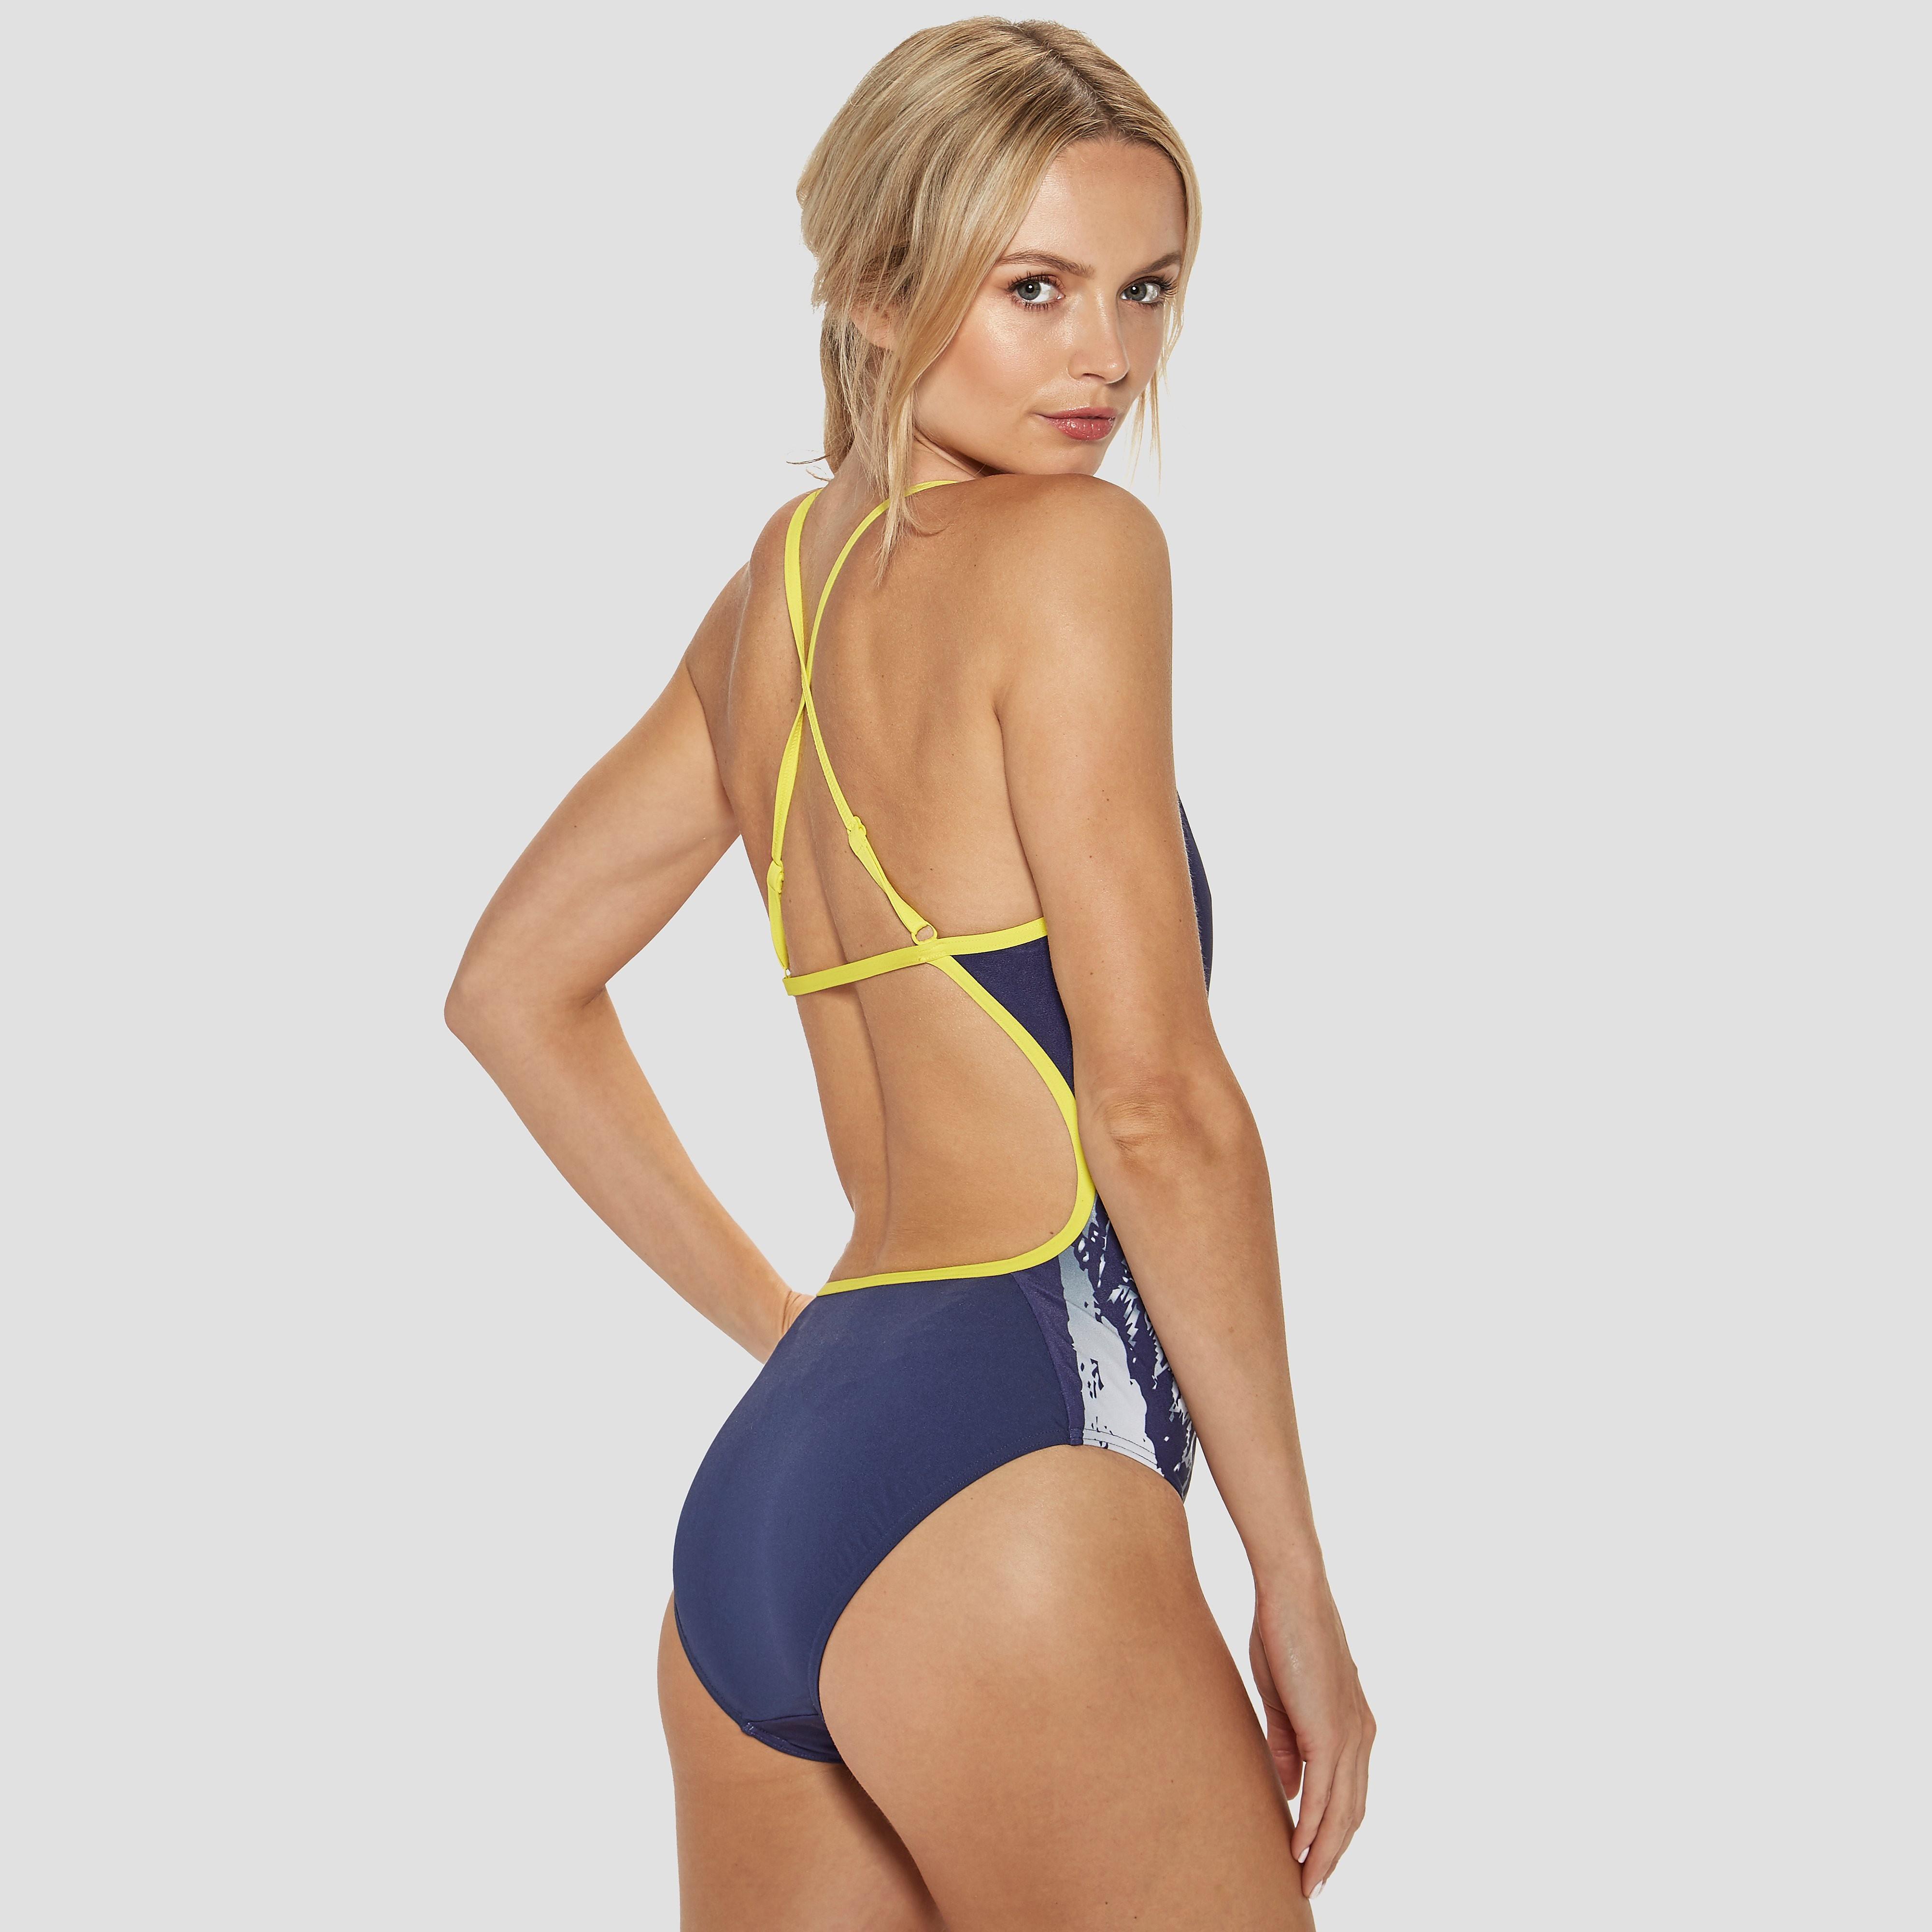 Arena Sarah Sjöström Elite Swimsuit